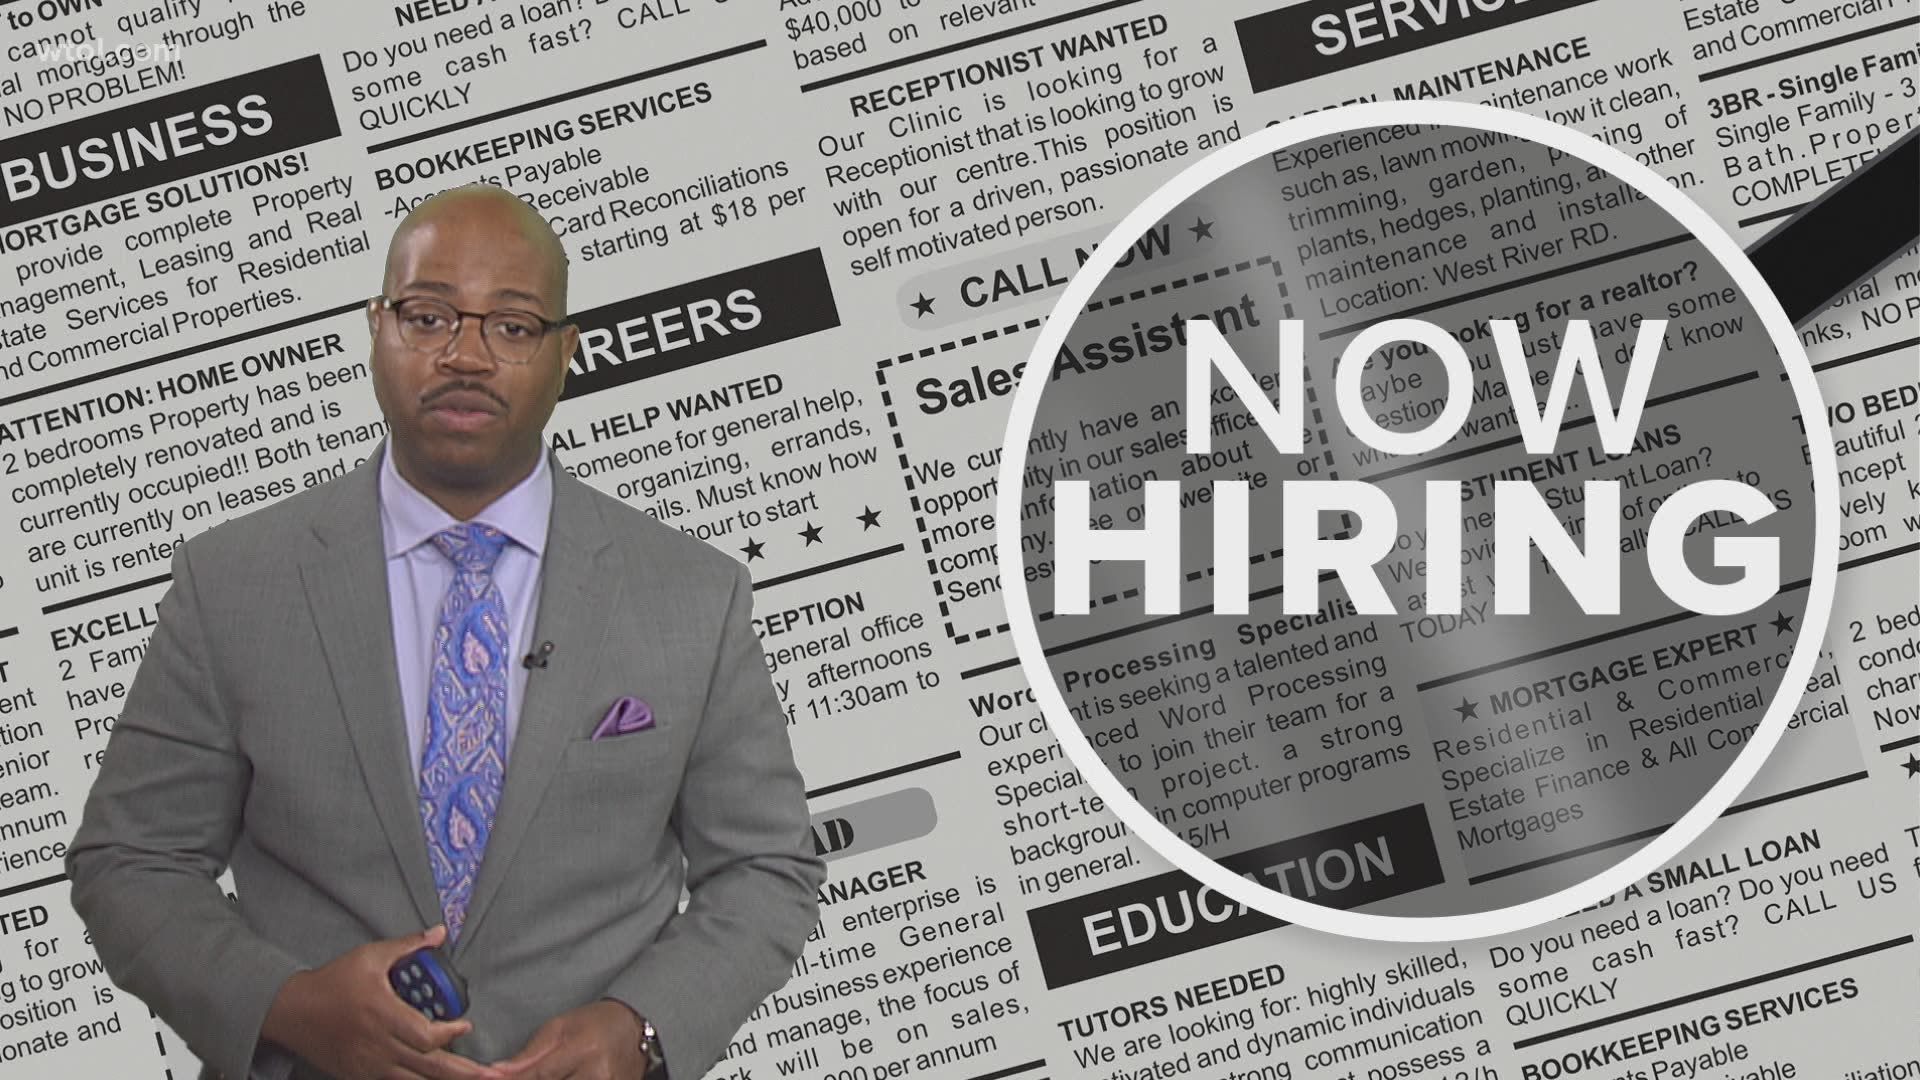 Job Openings In The Toledo Area Wtsp Com